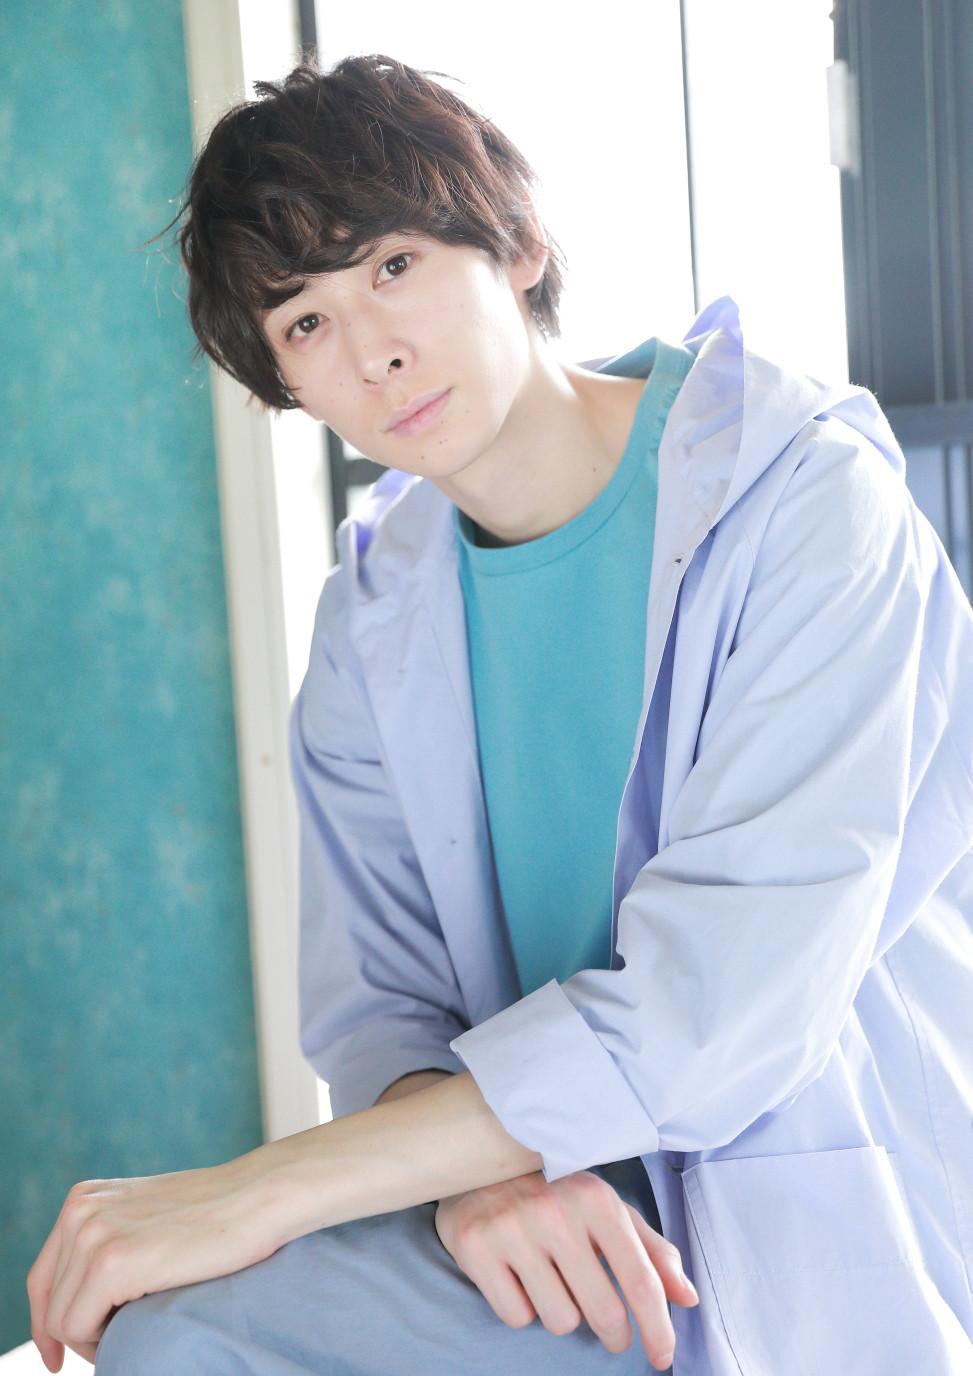 tanaka_ryosei.jpg